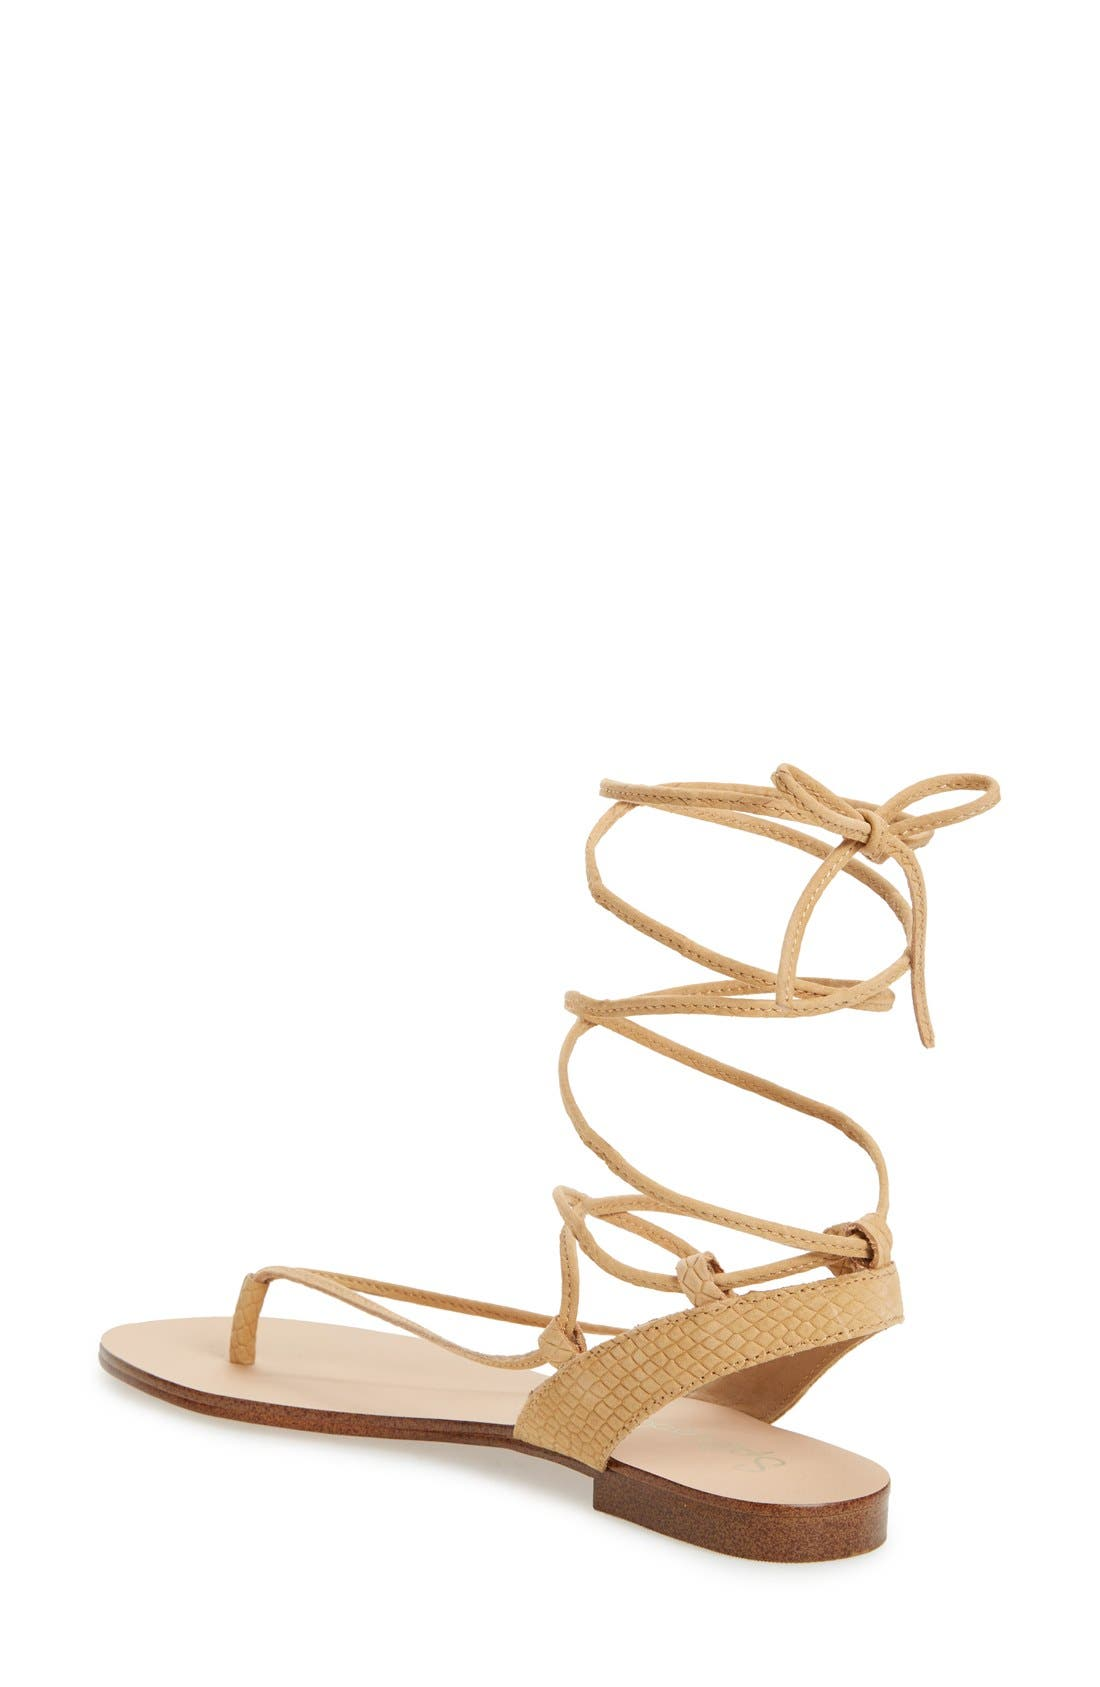 Alternate Image 2  - Splendid 'Candee' Wraparound Lace Flat Sandal (Women)